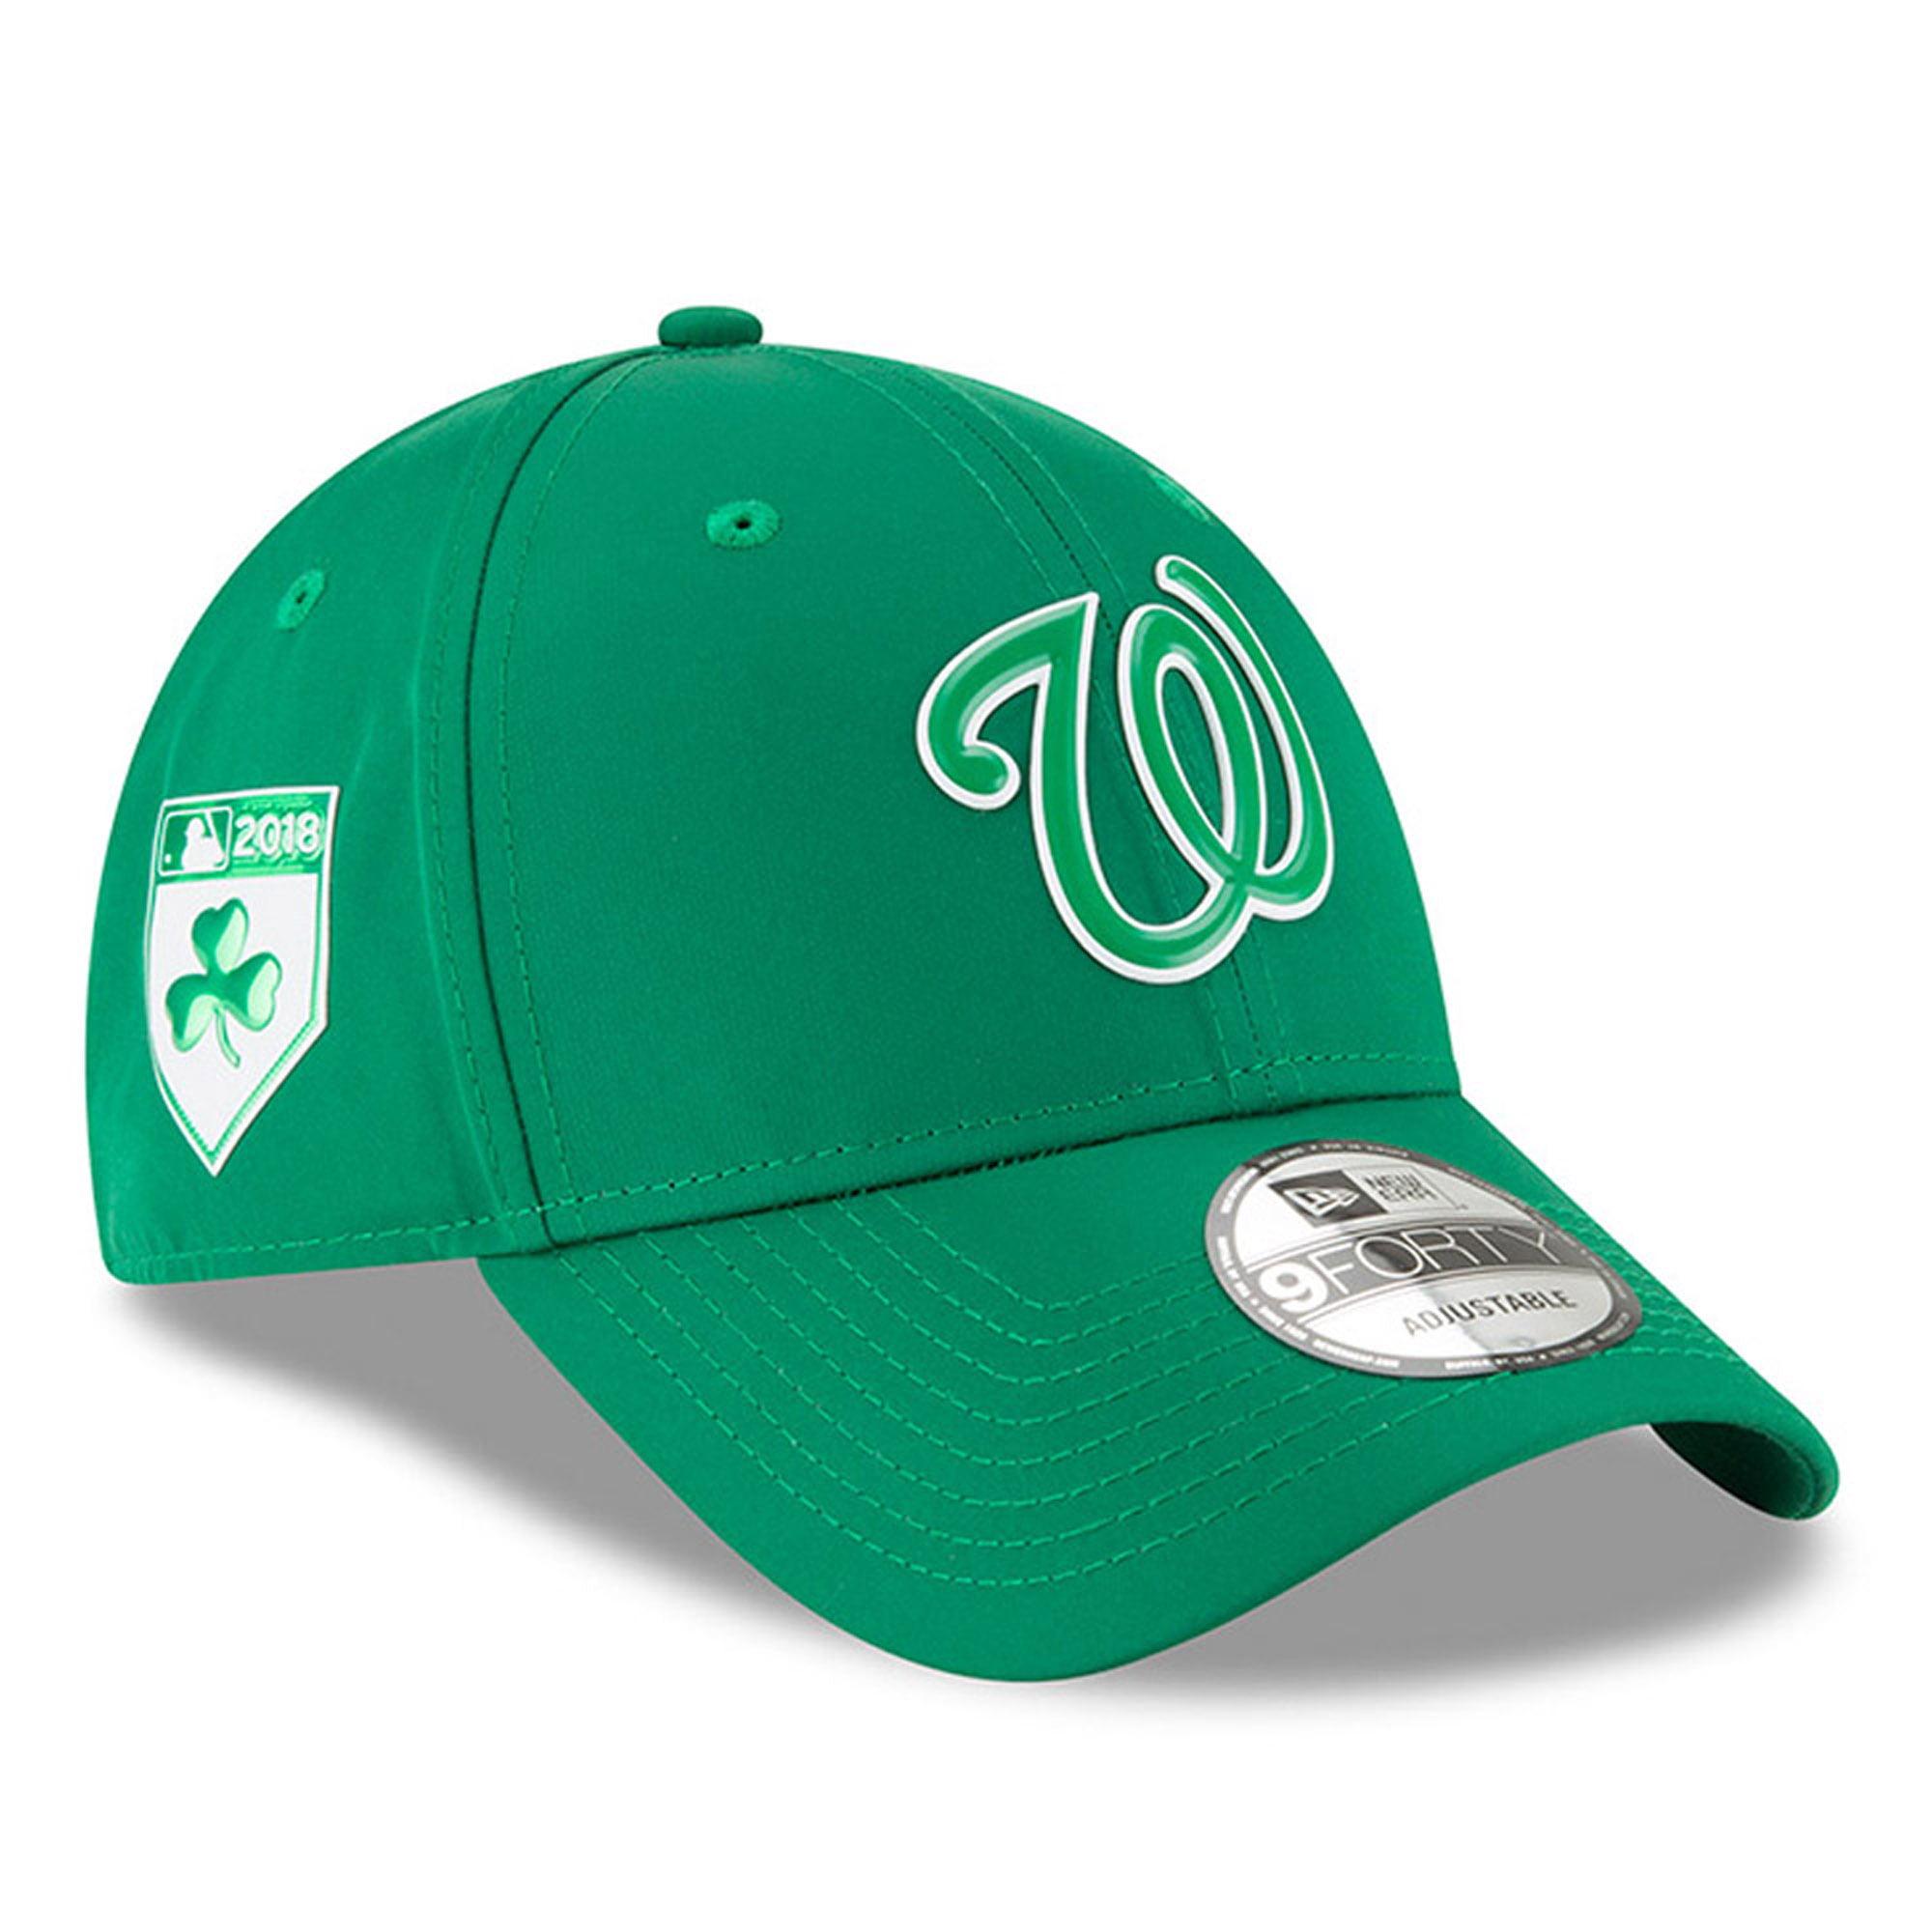 Washington Nationals New Era 2018 St. Patrick's Day Prolight 9FORTY Adjustable Hat - Green - OSFA